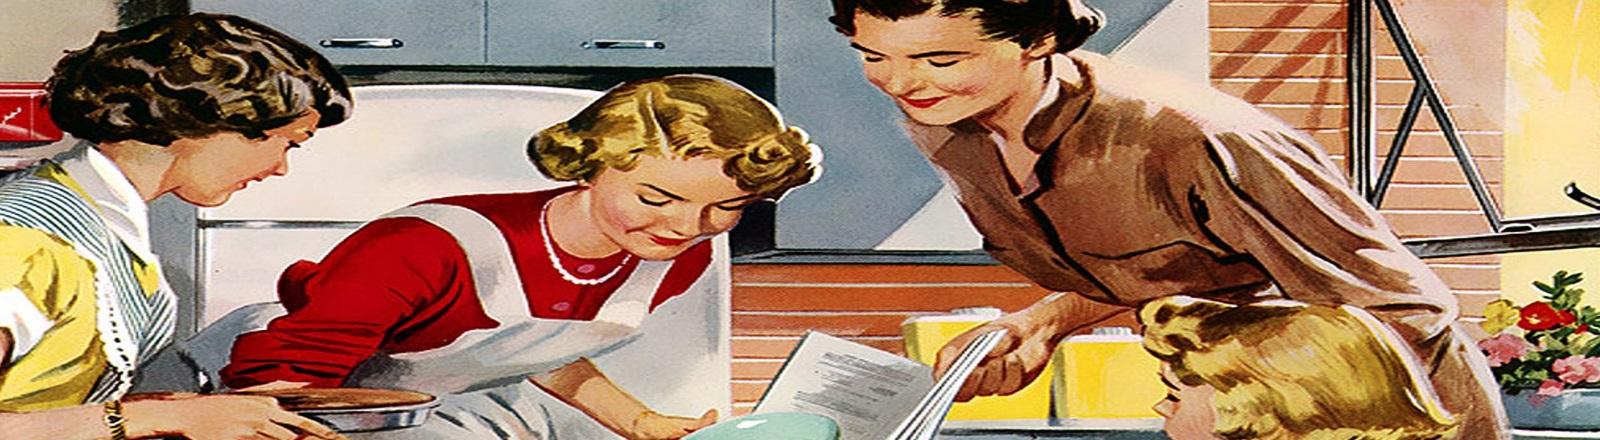 Femmes au foyer rétro